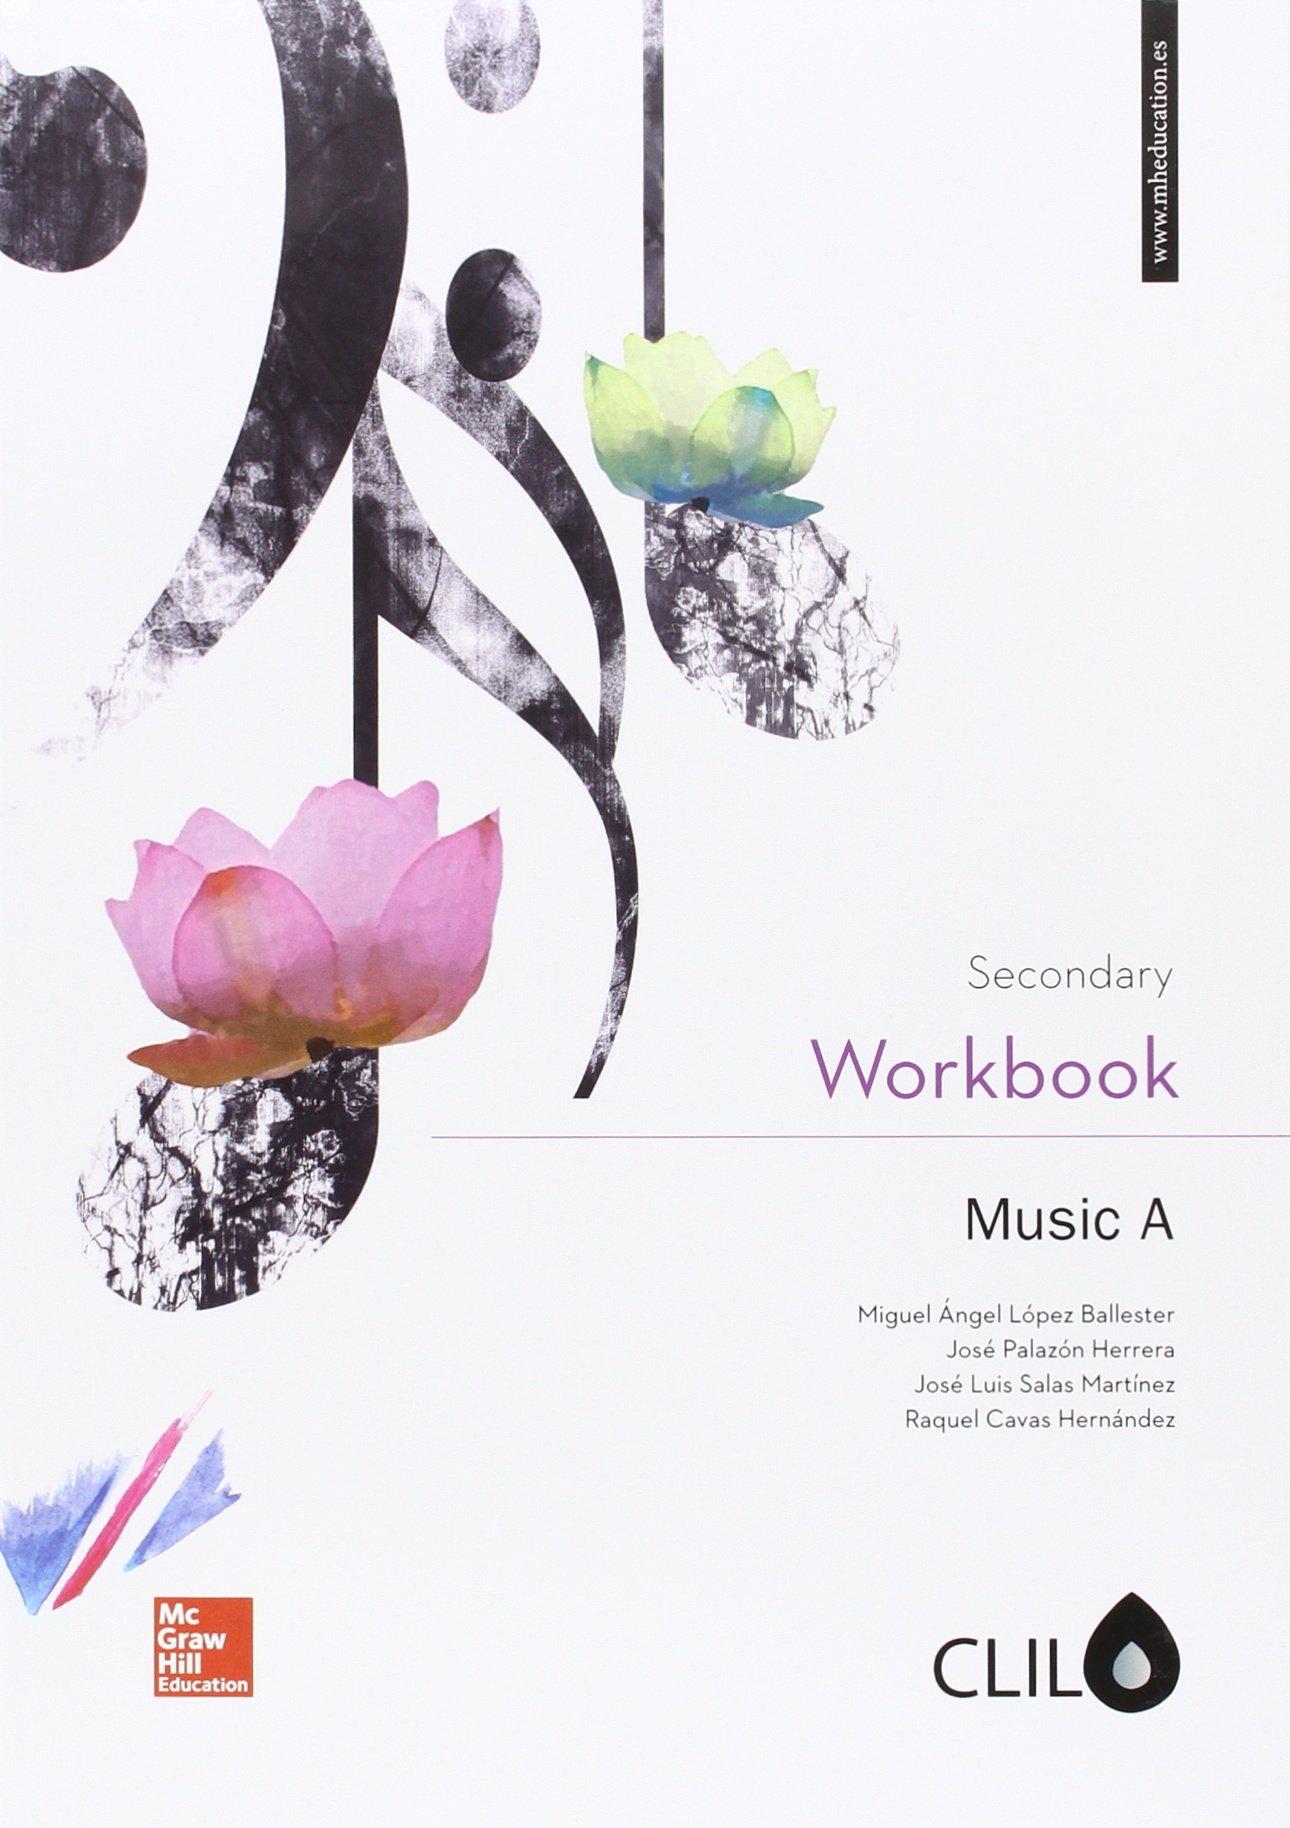 Music A Secondary. Clil. Workbook - 9788448608958 Tapa blanda – 19 ago 2016 844860895X Educational material Educational: Music YQ